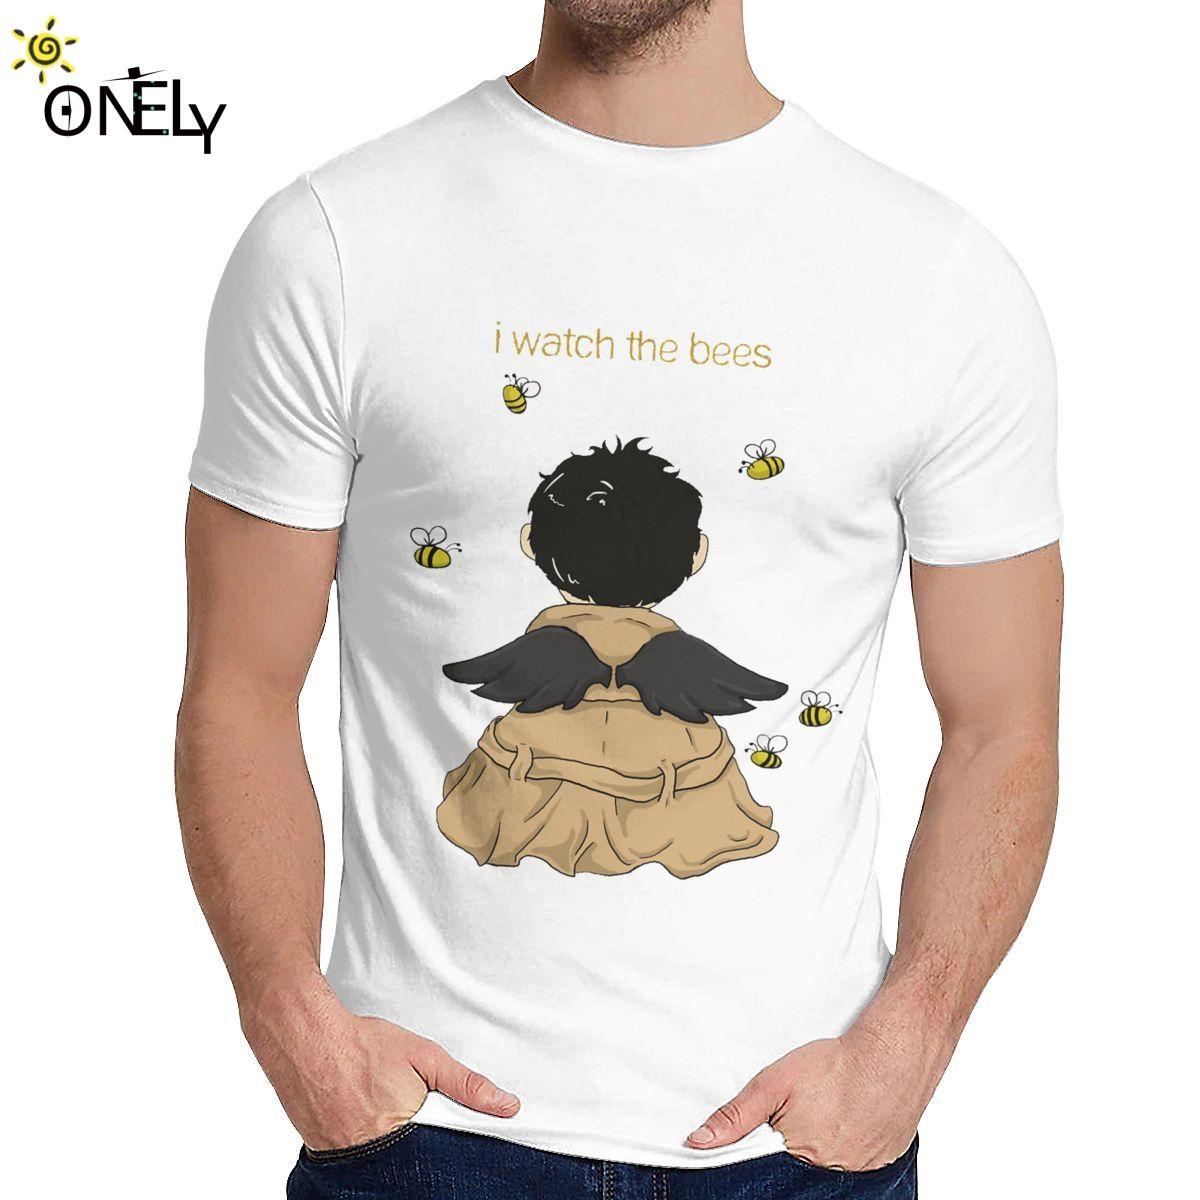 2019 Сверхъестественной футболка Spn Brothers Angel I Часы Пчела Homme Tee Shirt Unisex